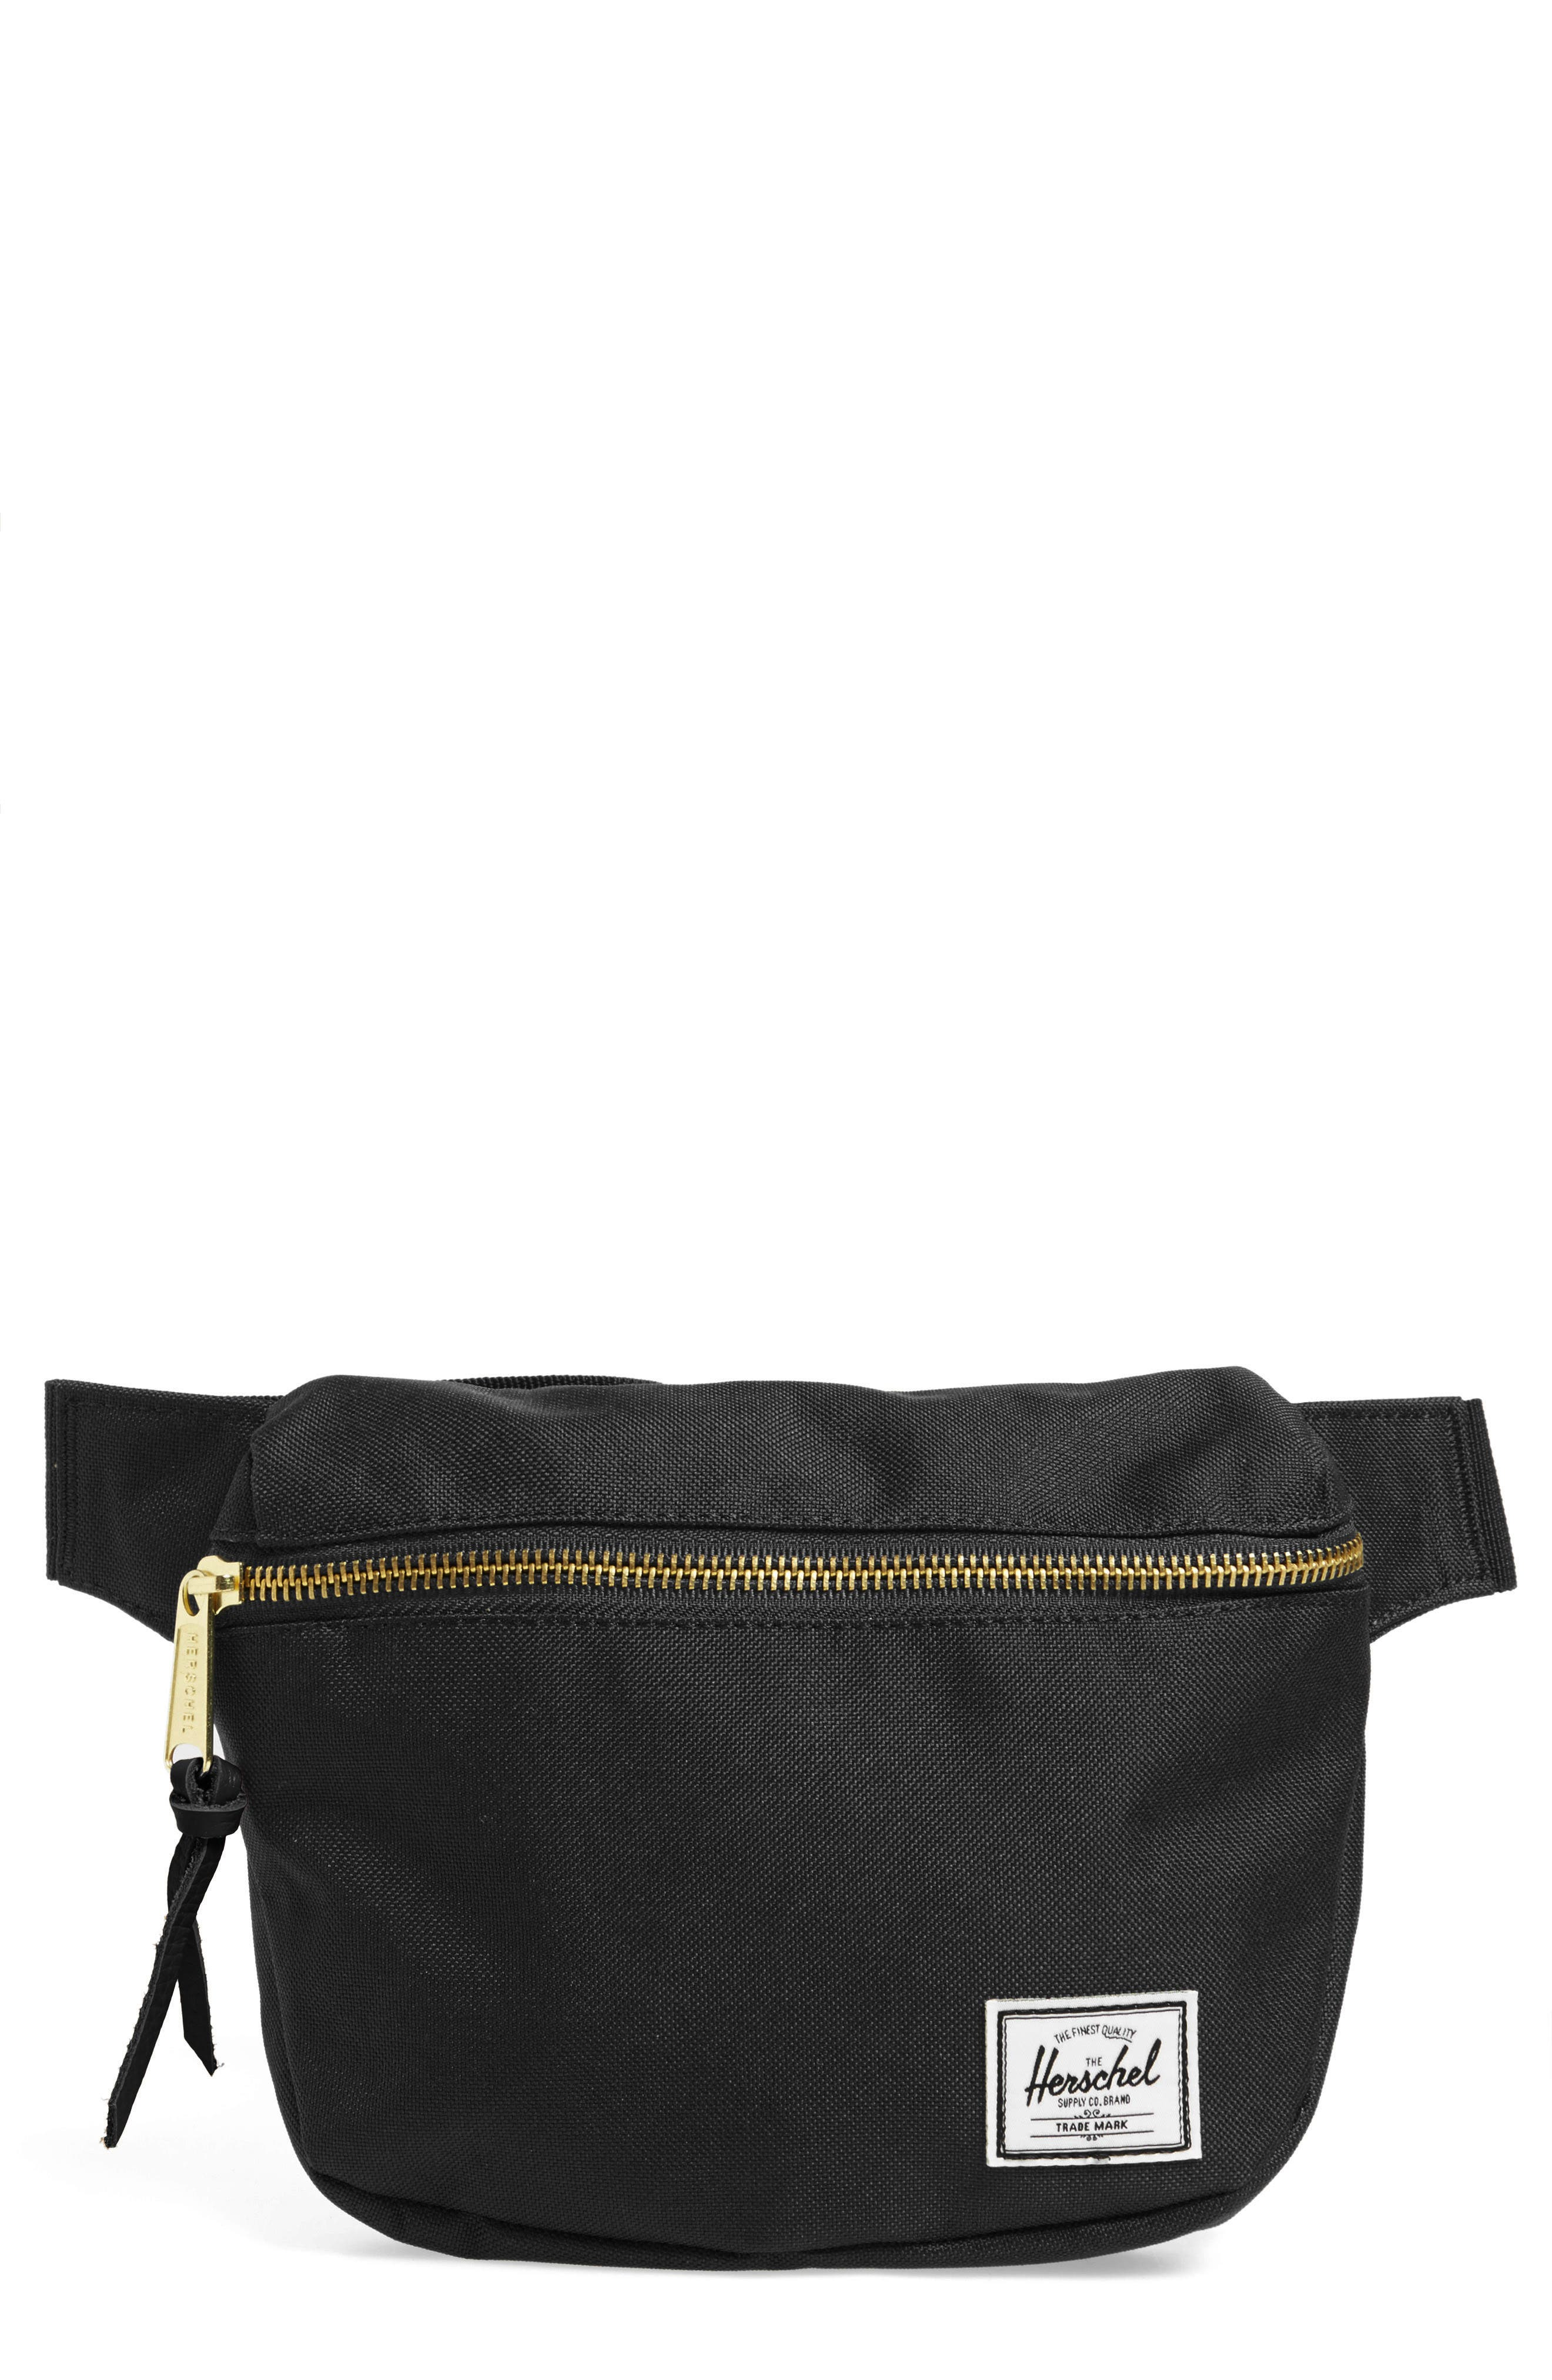 792c6ce610b5 Pink Crossbody Bags